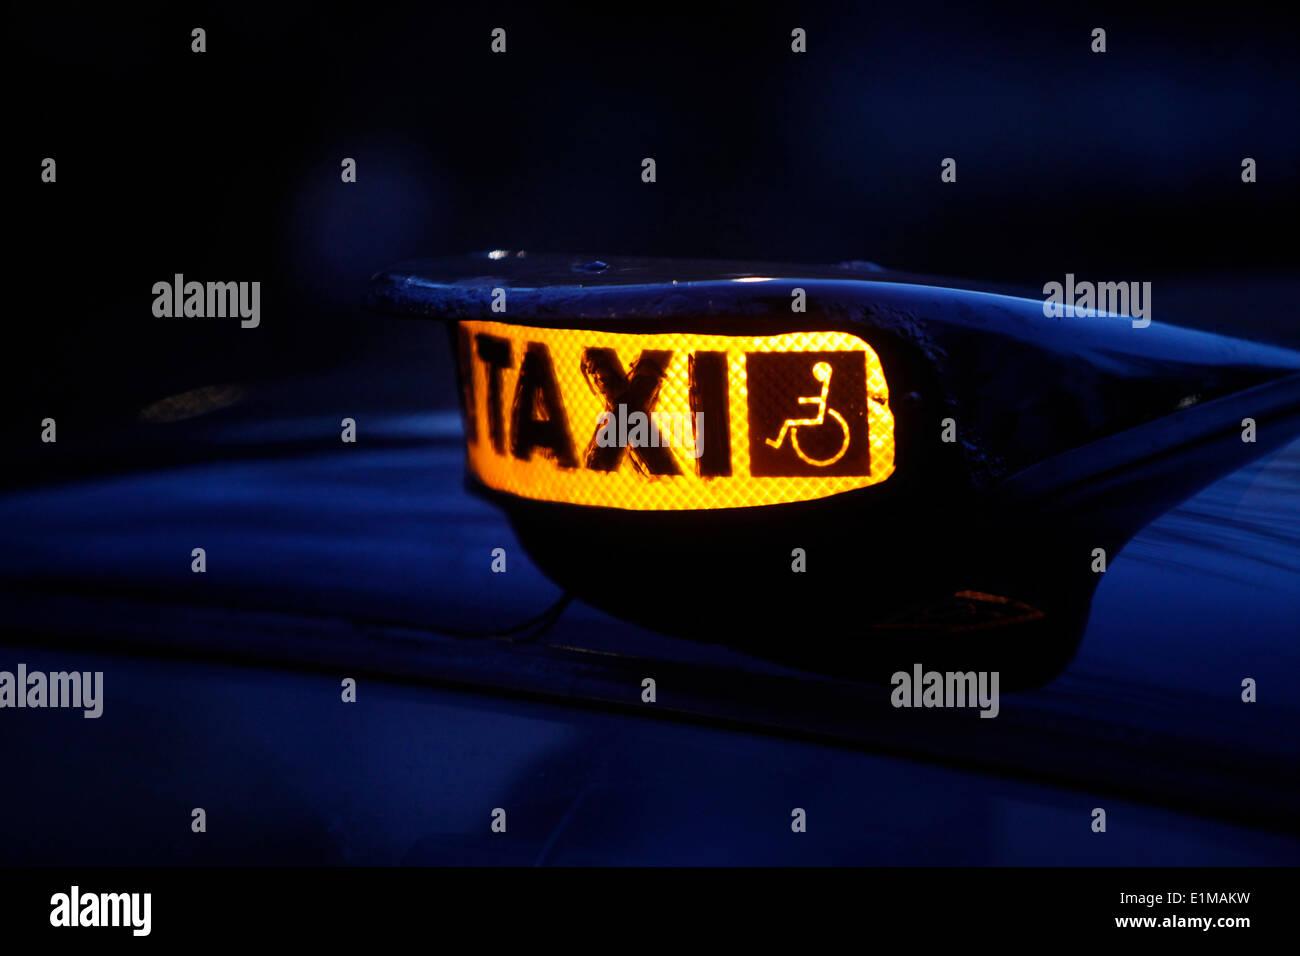 Signo de taxi de Londres Imagen De Stock